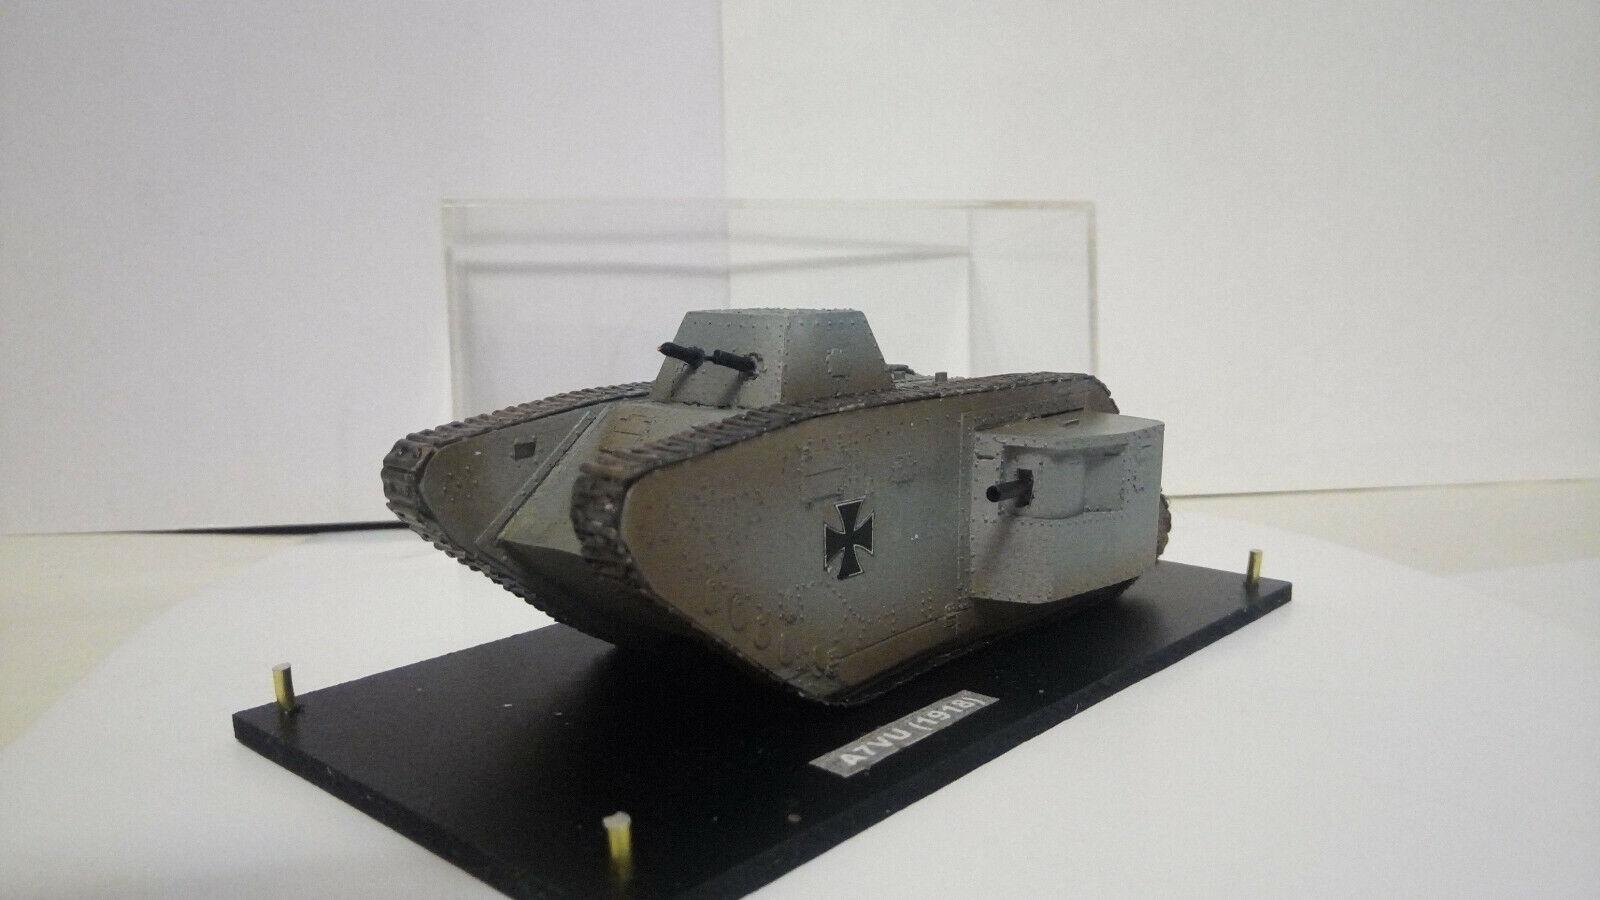 popular Char allemand allemand allemand  A7VU  1918 (1 72)   resine  Entrega directa y rápida de fábrica